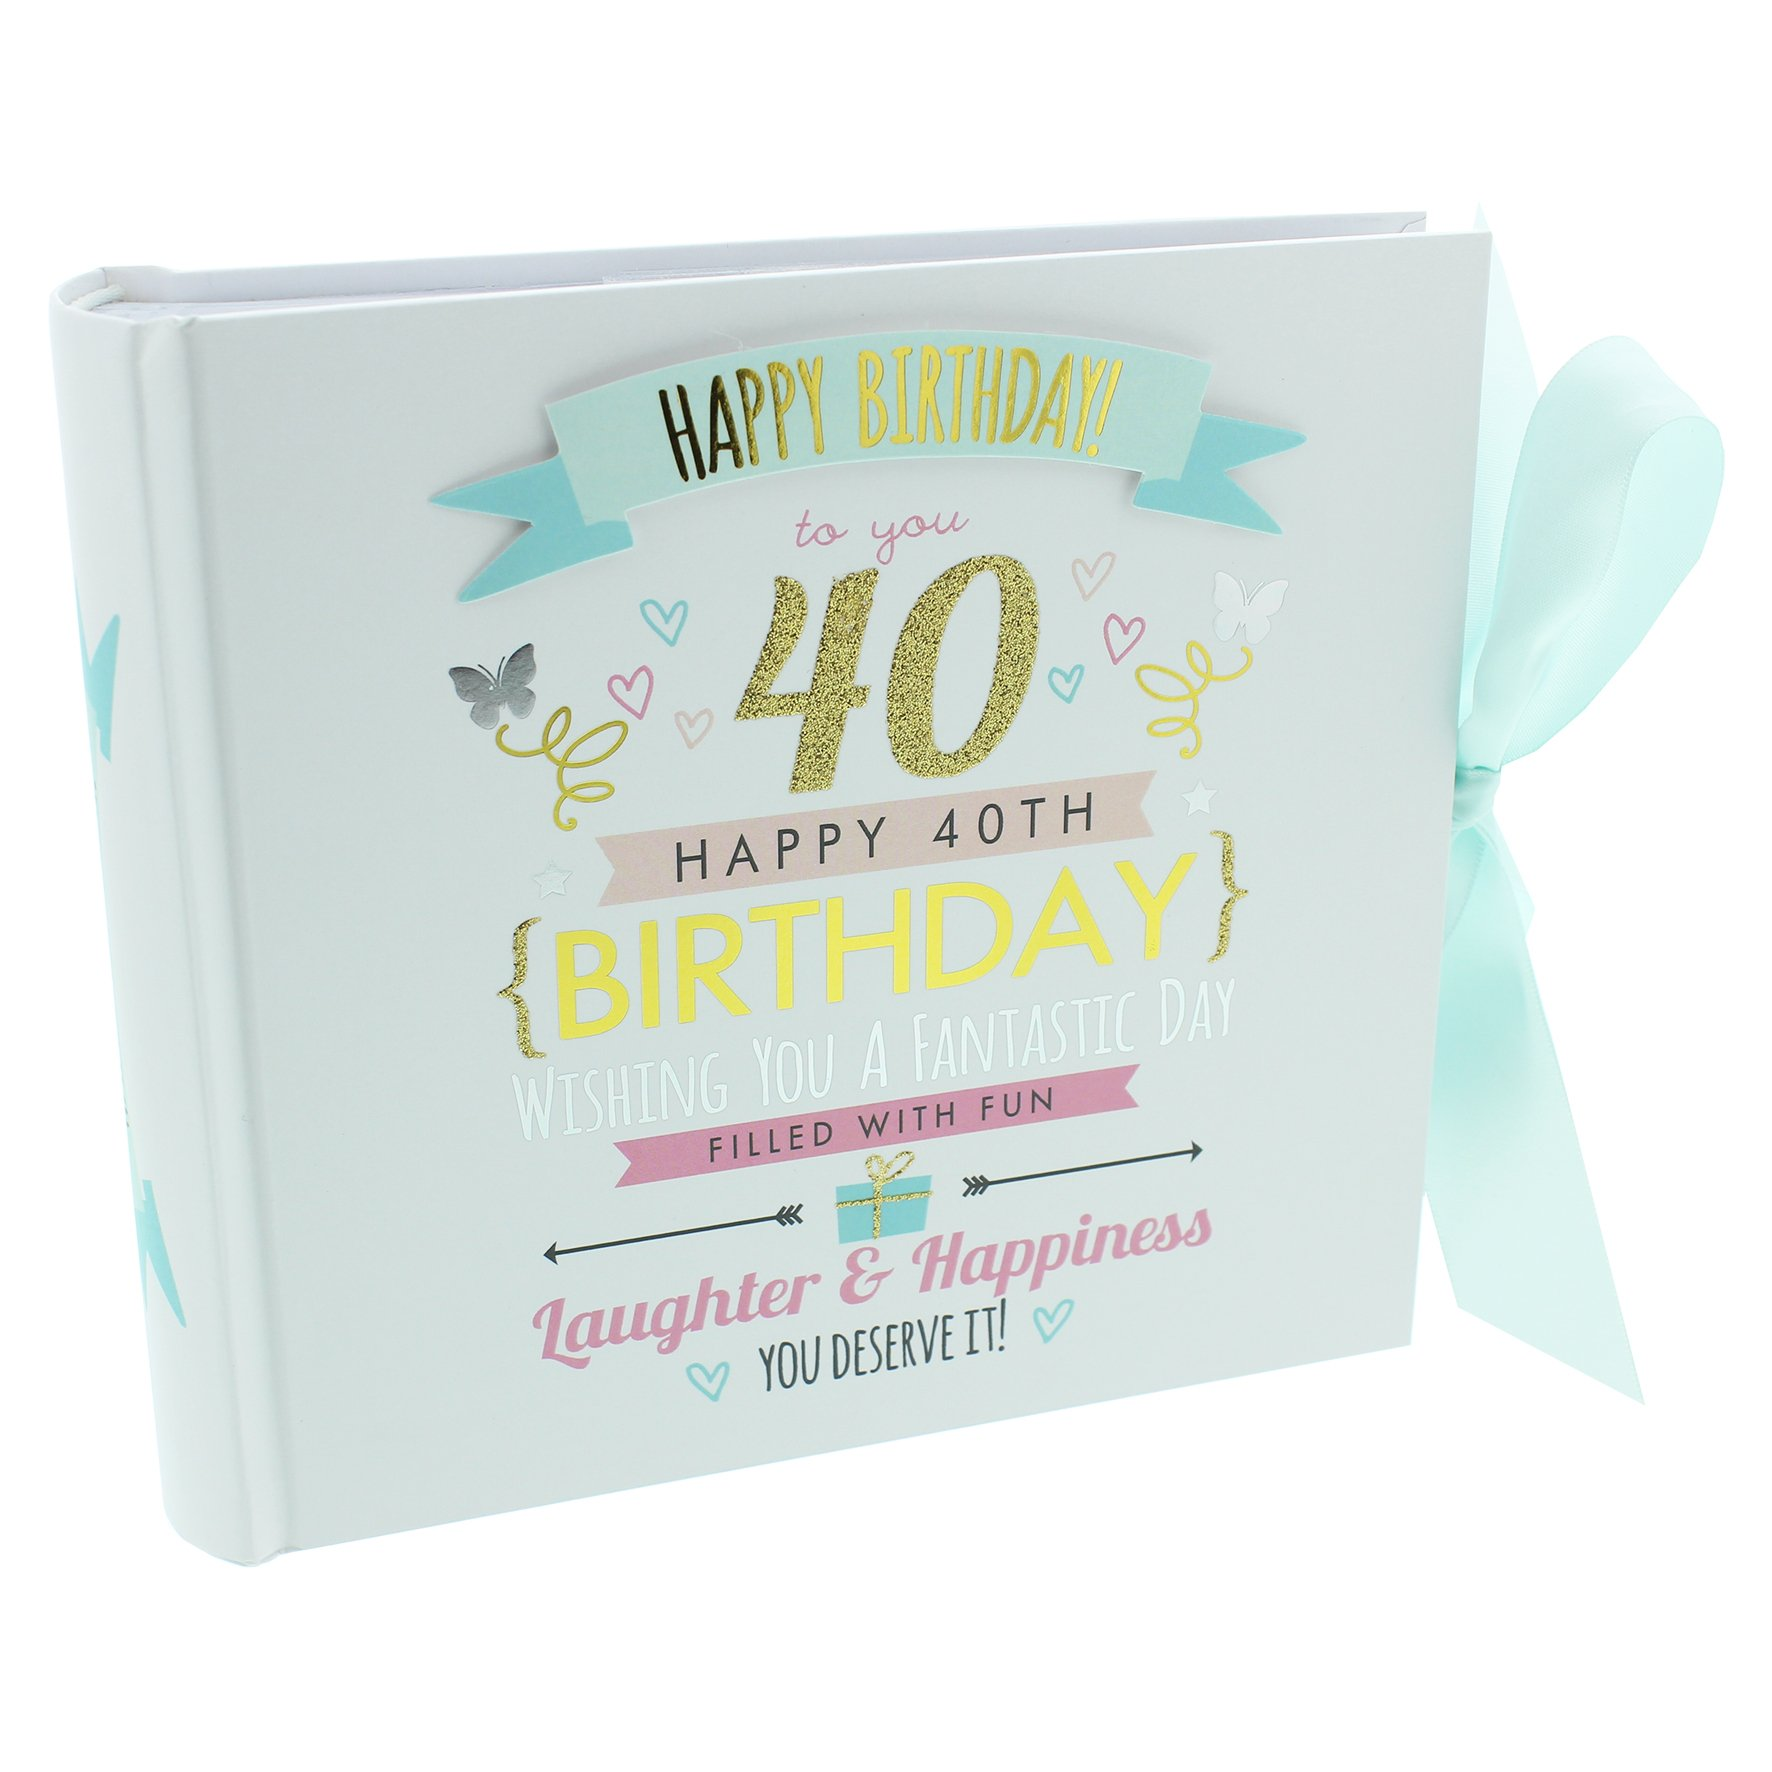 Oaktree Gifts 40th Birthday Girl Photo Album Hold 4 x 6